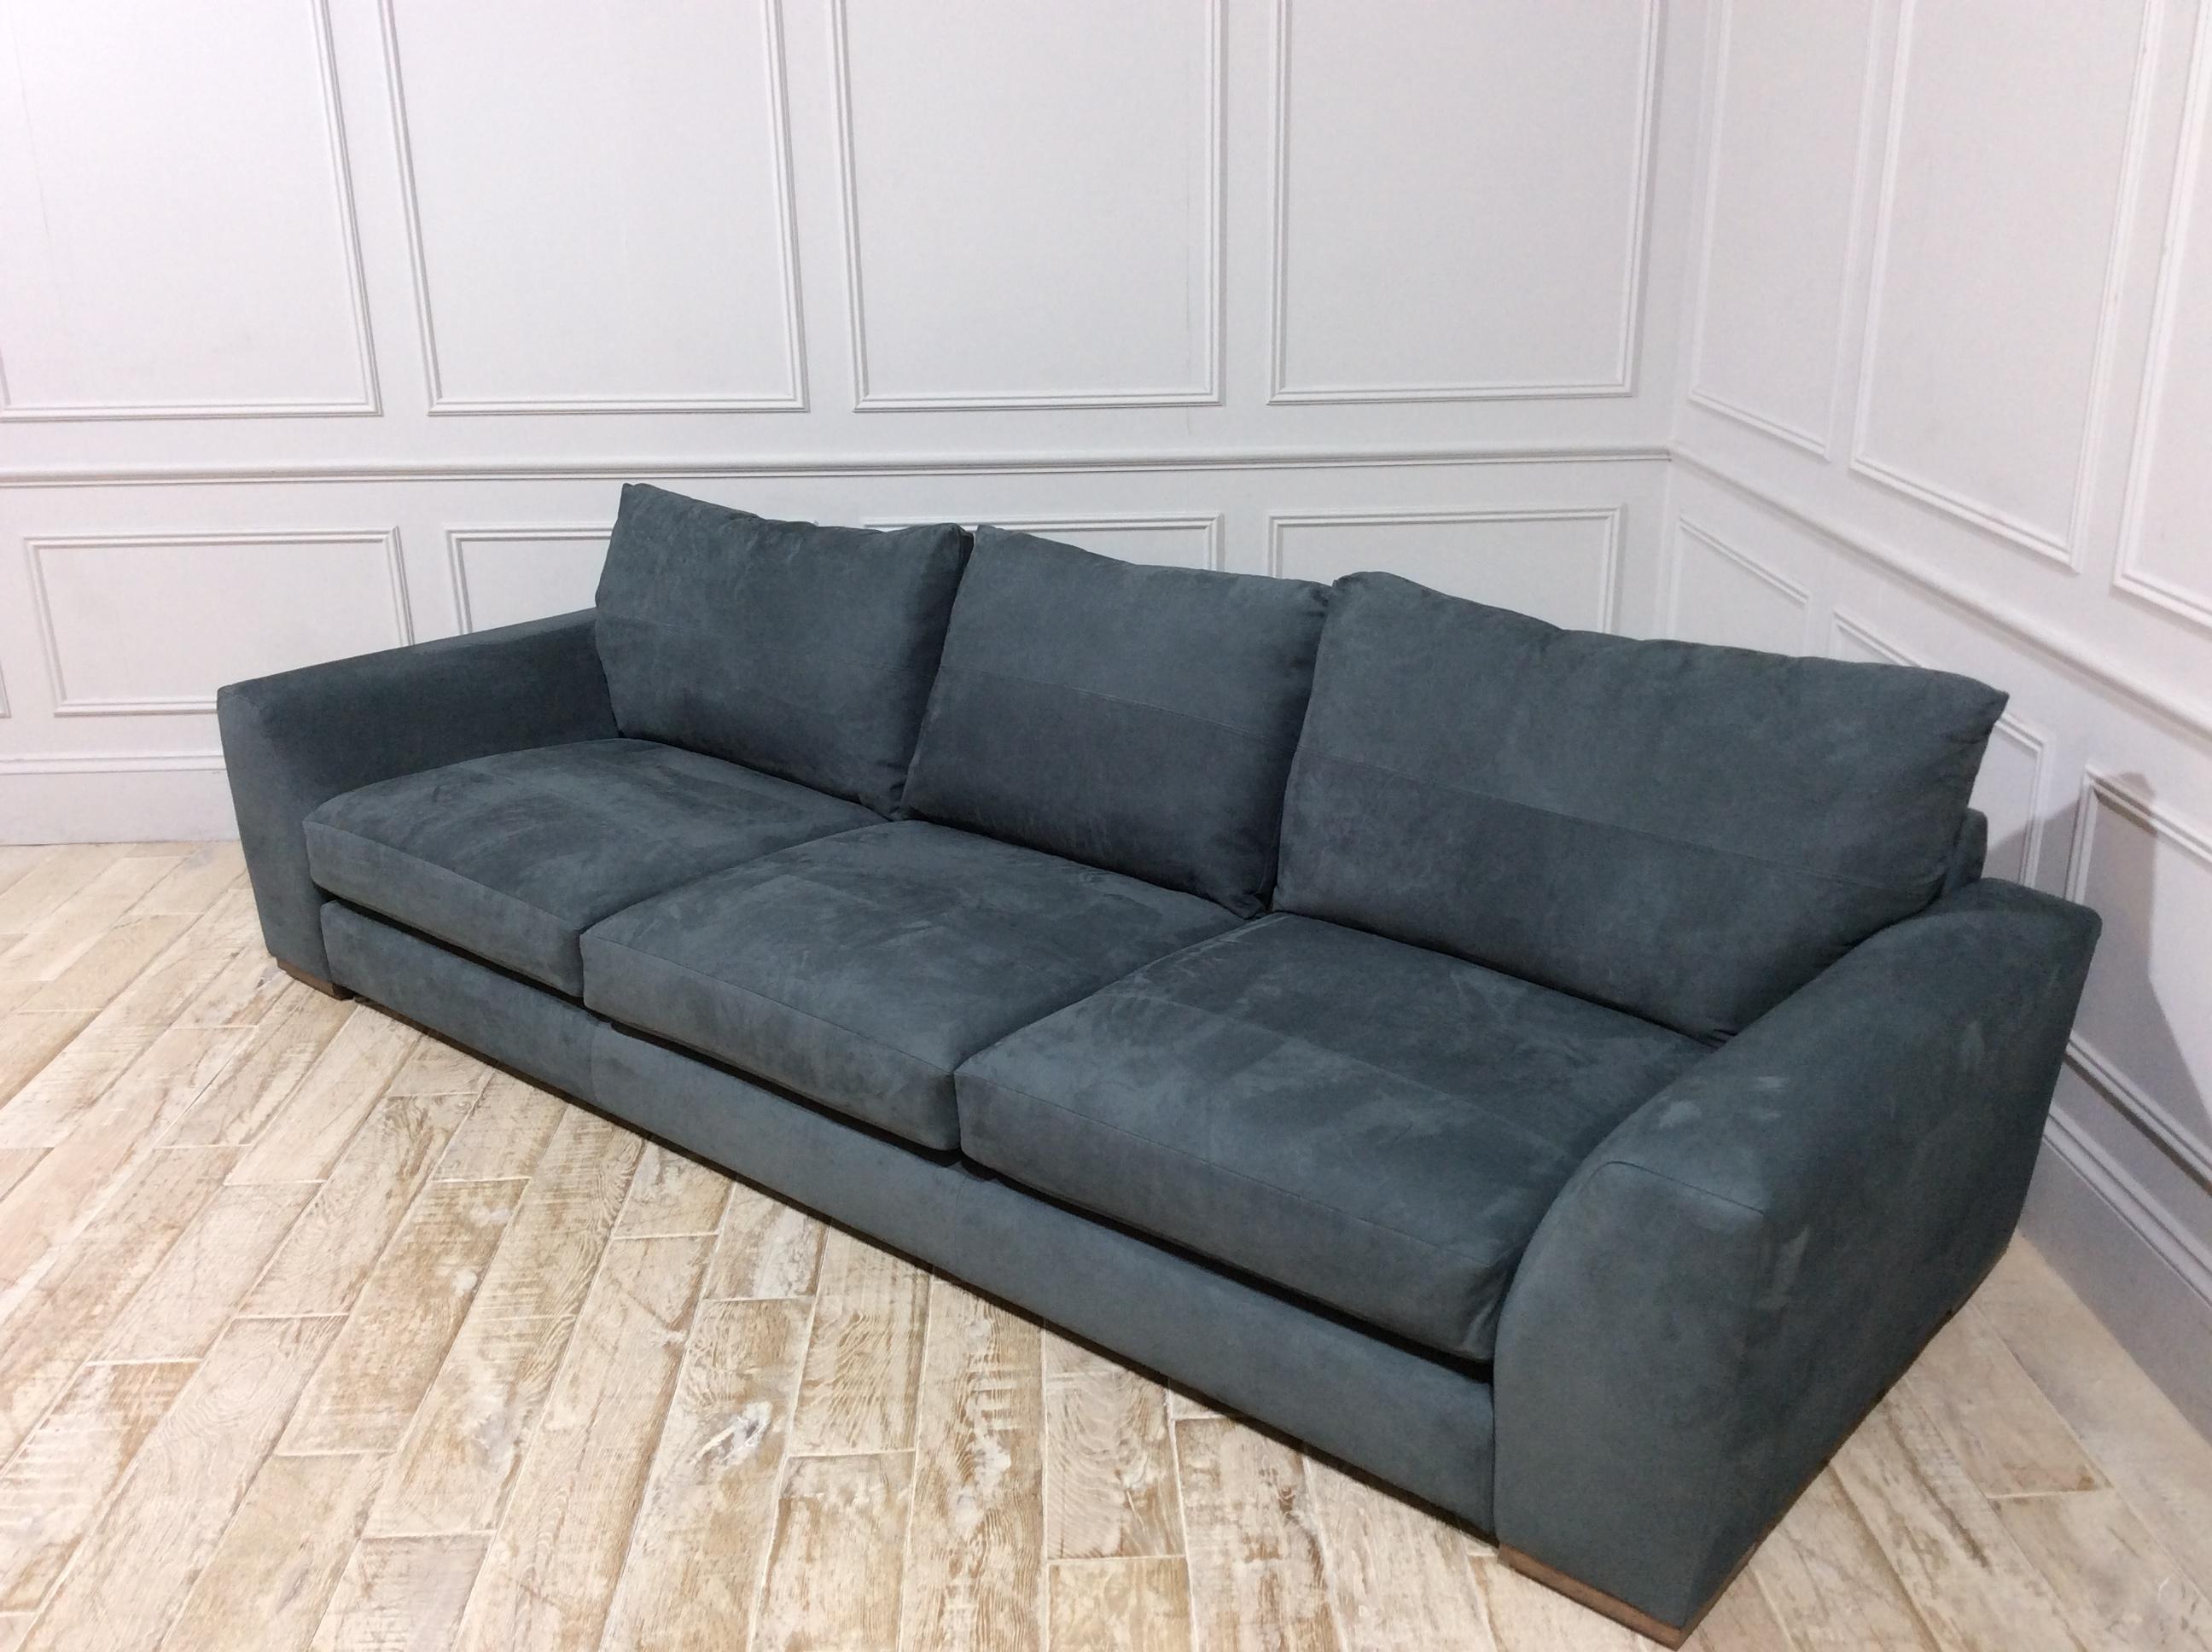 Kingston Super Grand Sofa in Nubuck Leather Gunmetal Grey